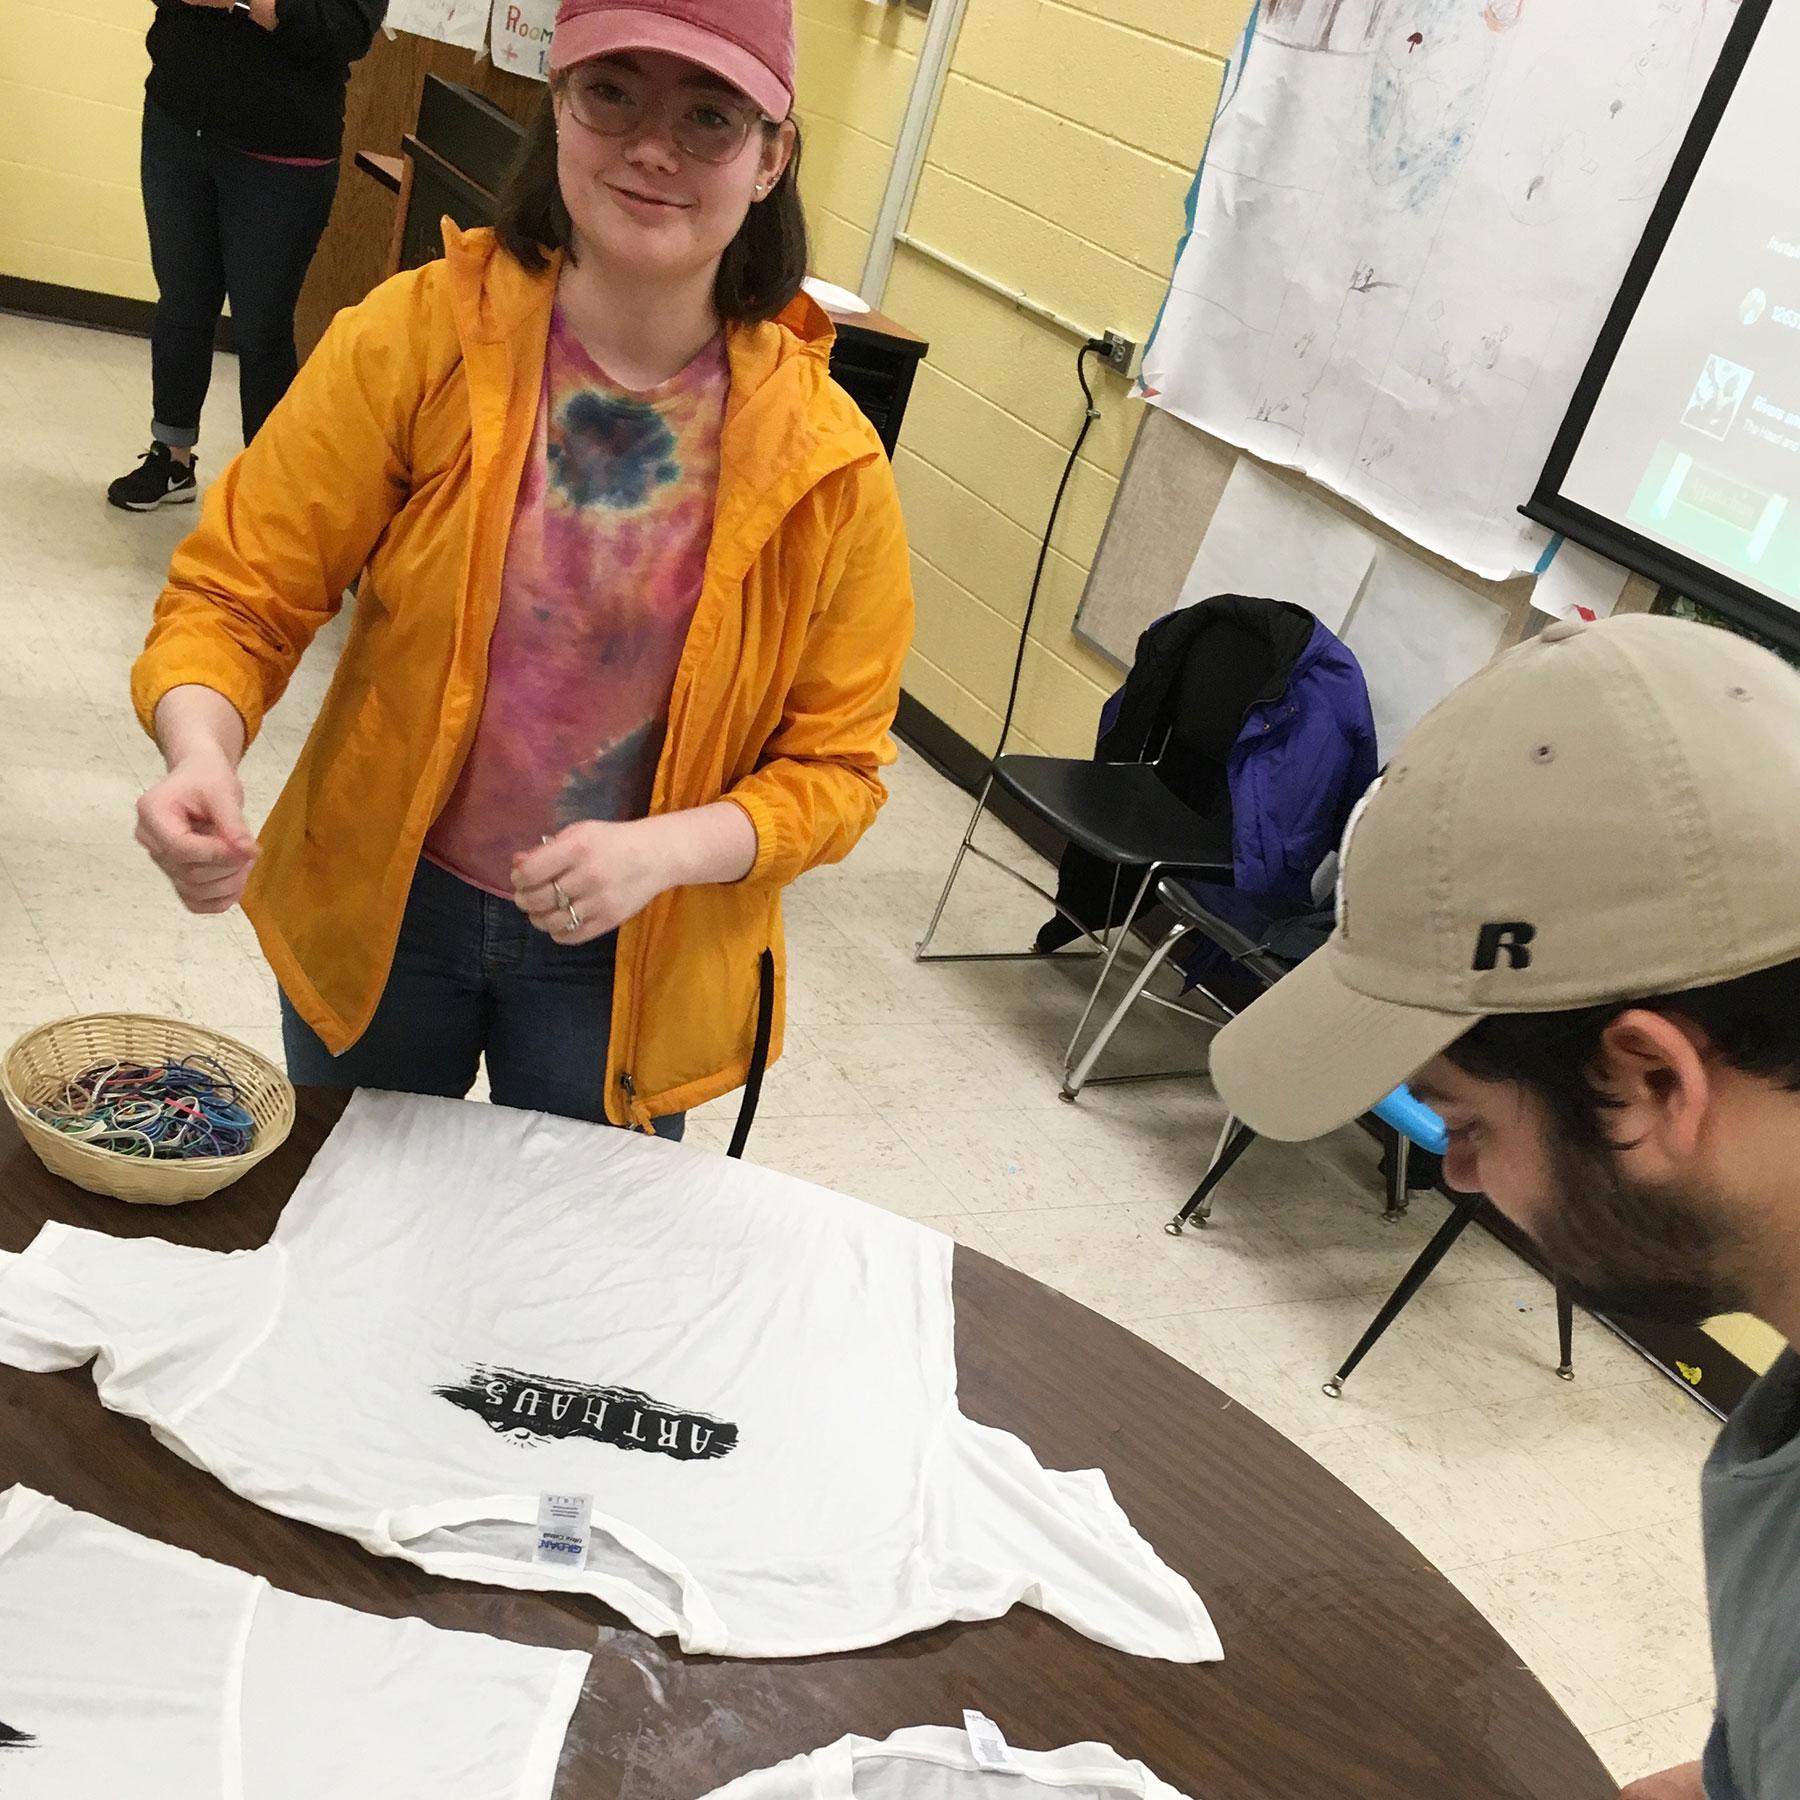 Art Haus residents preparing tie dye shirts